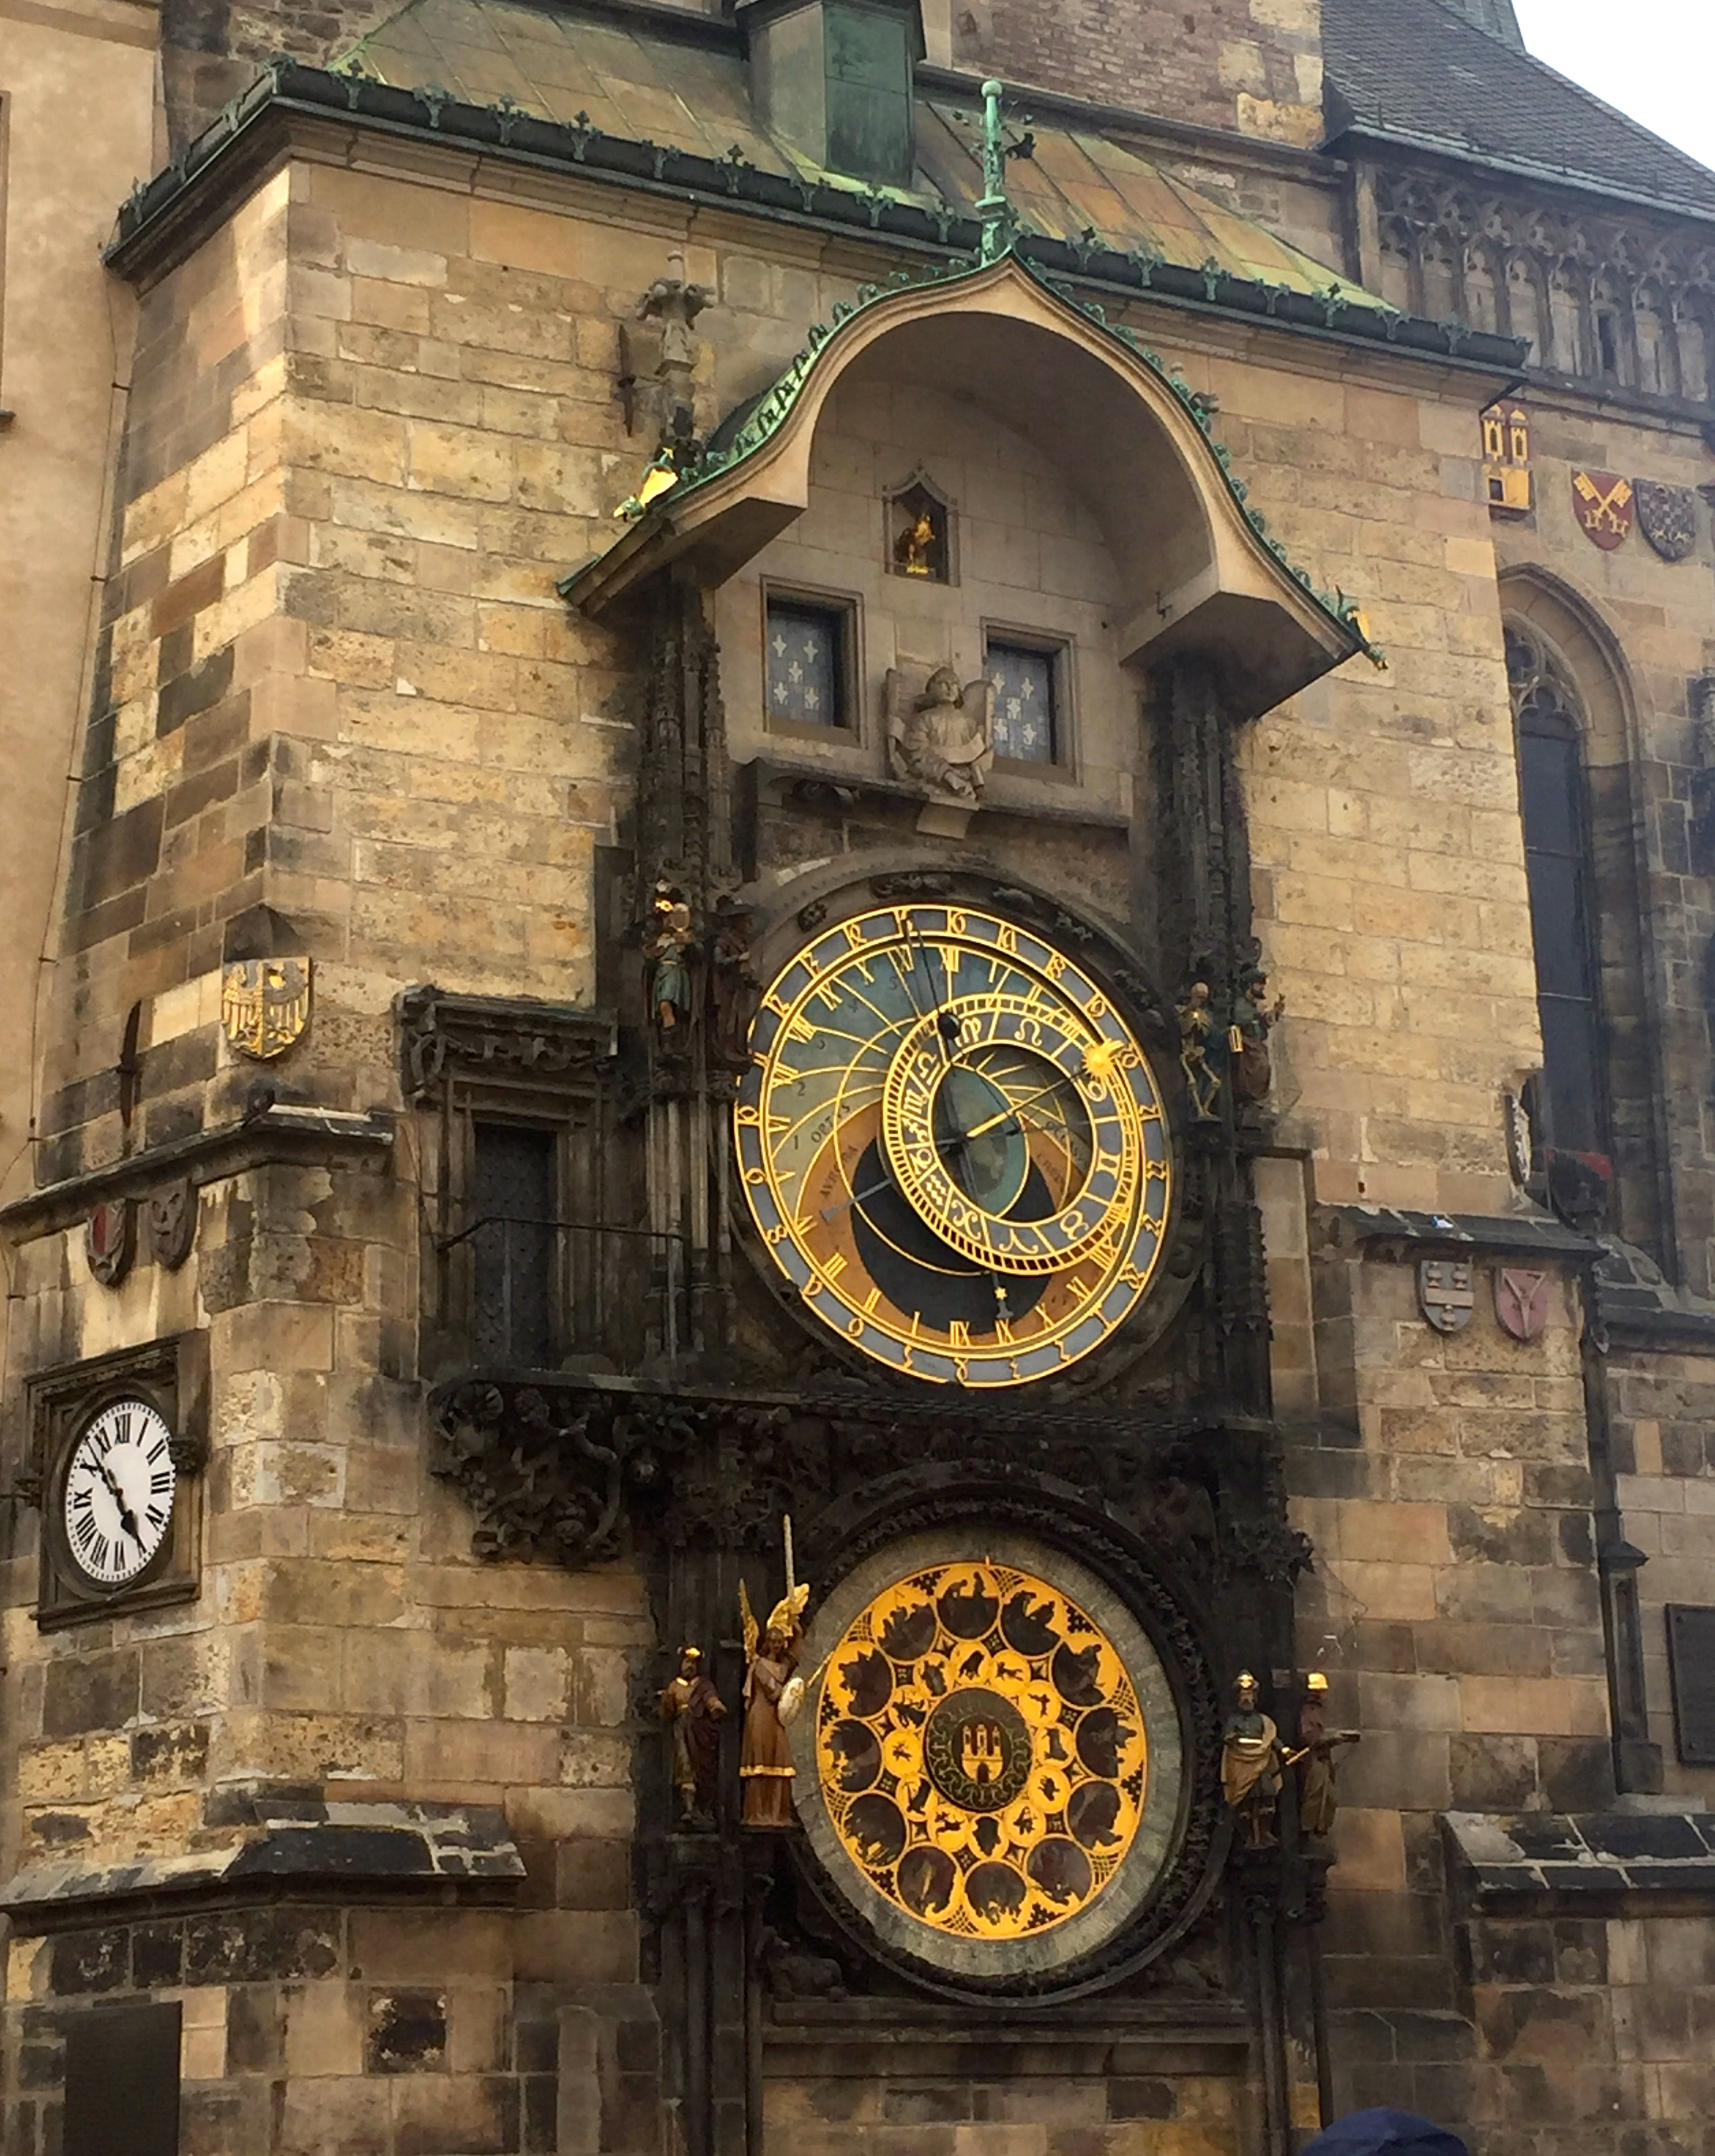 astrological-clock-prague-attractions